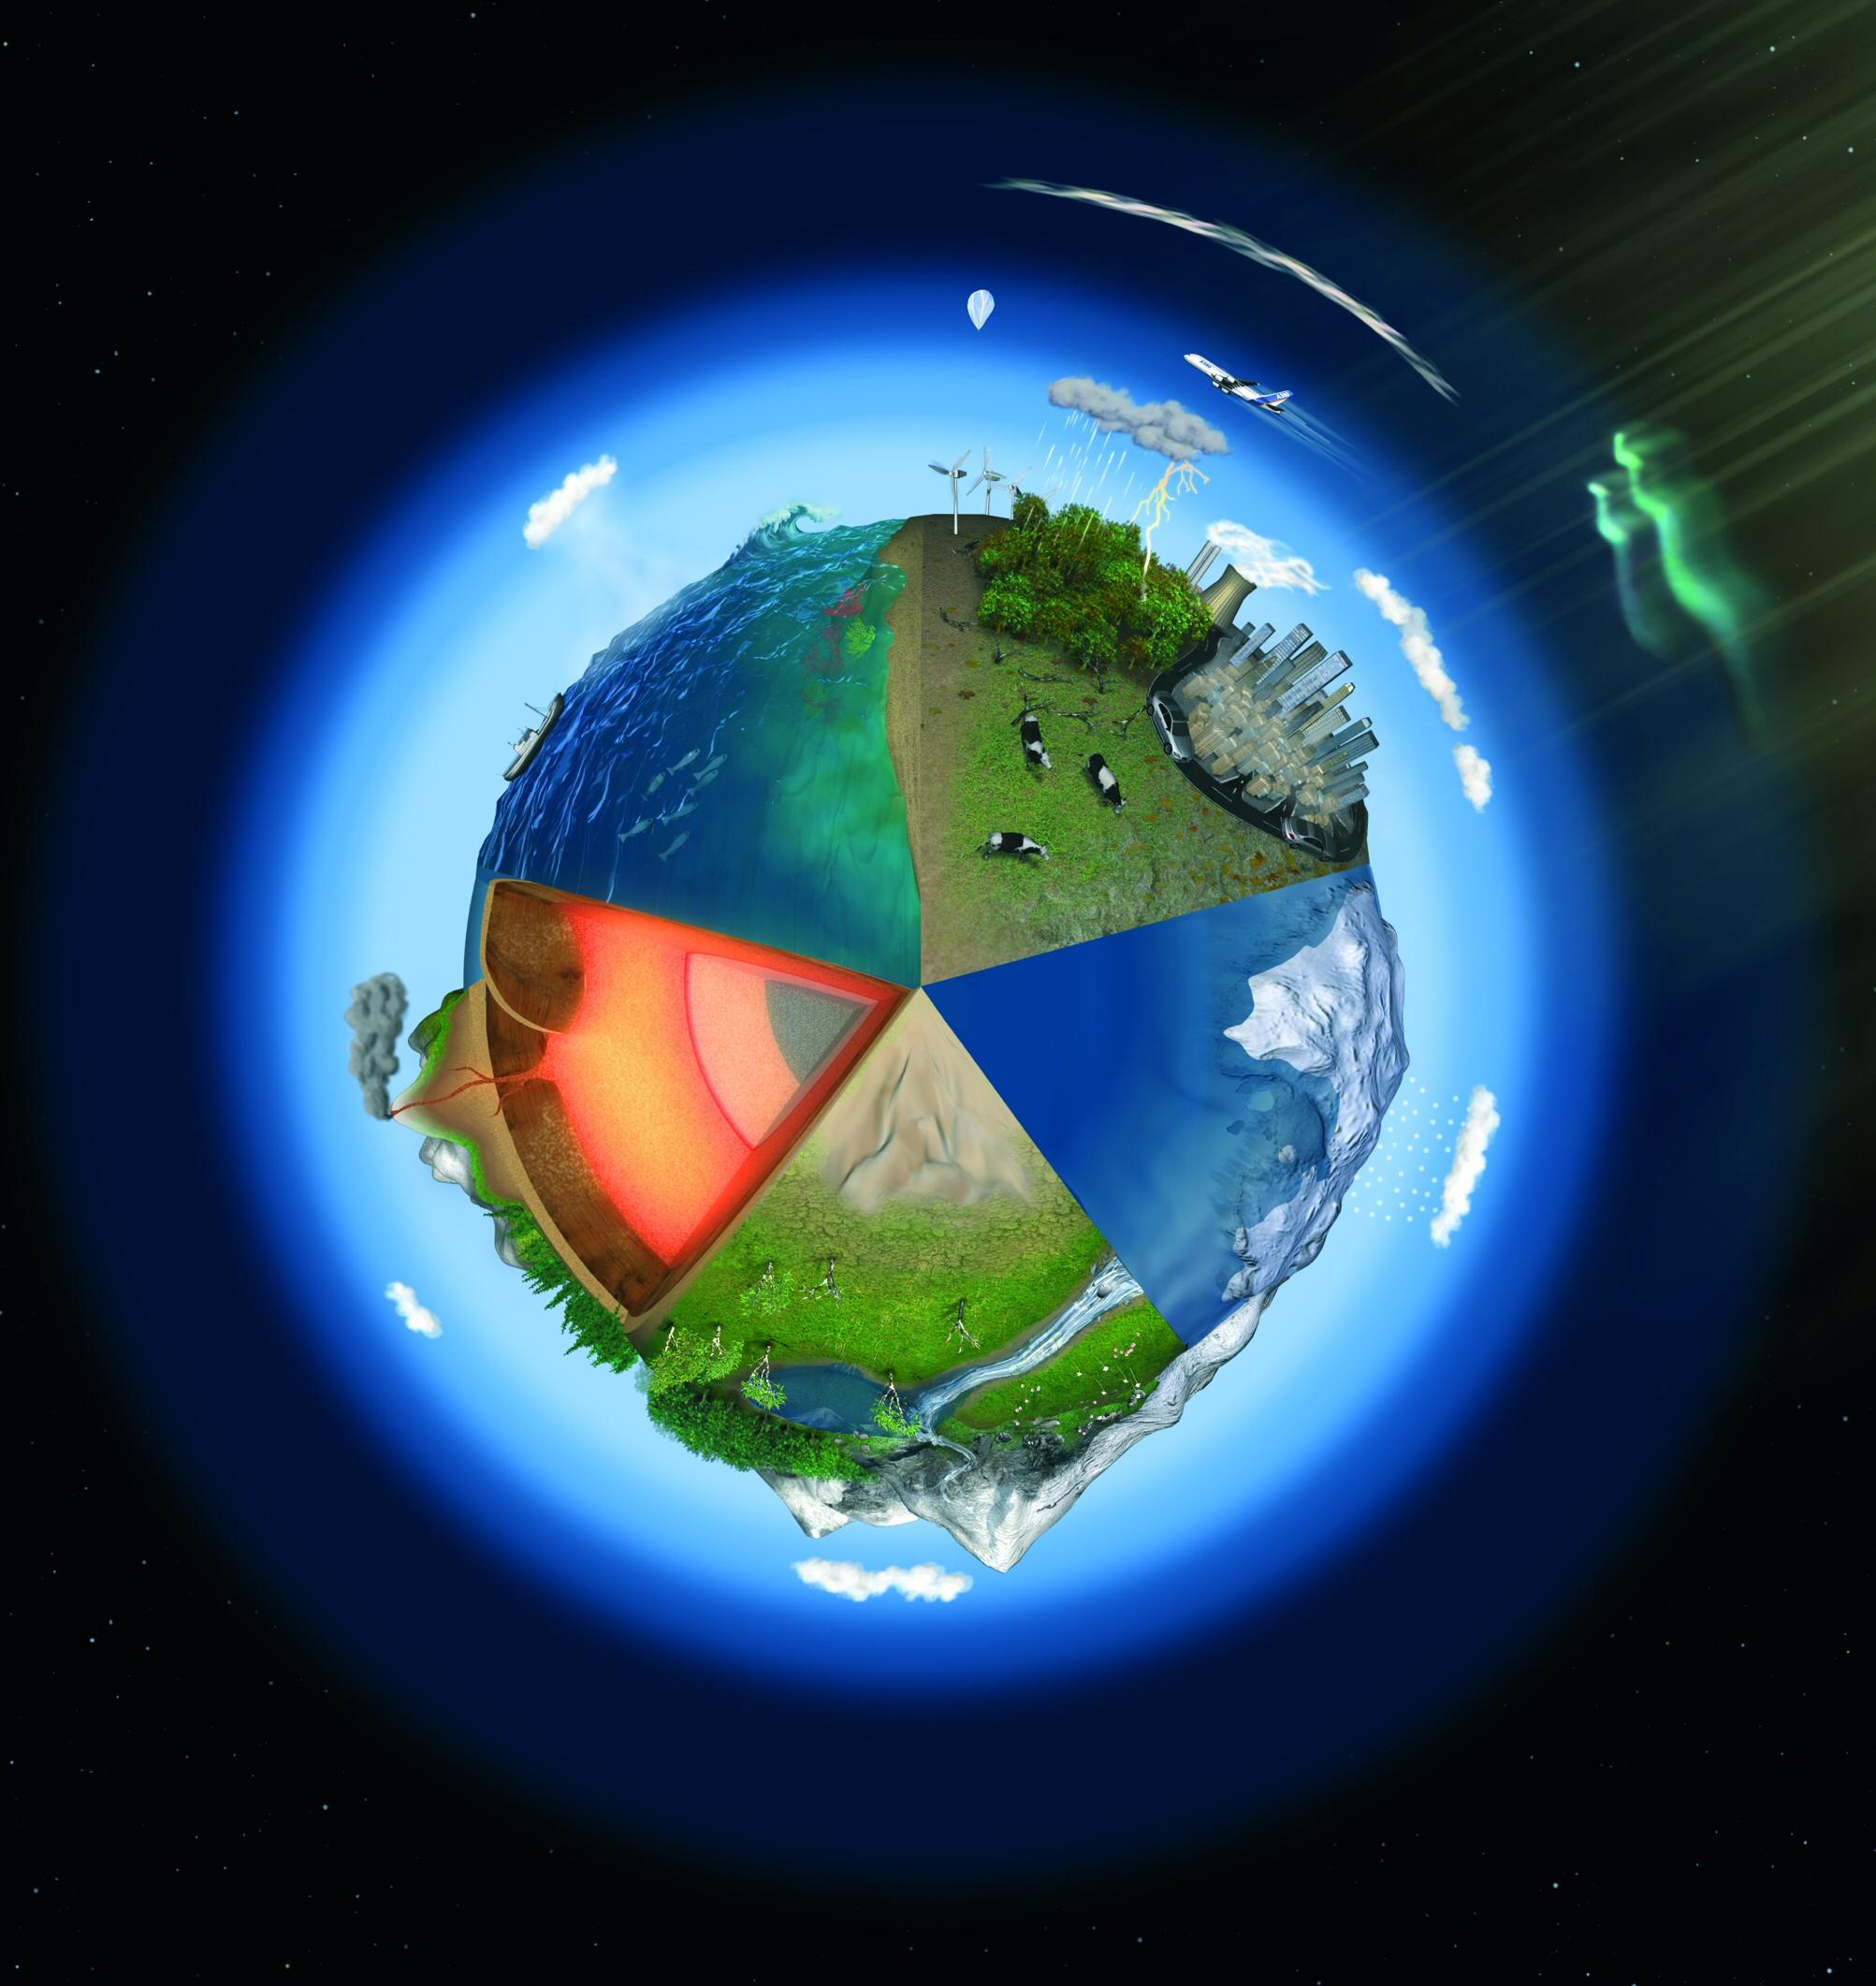 esa_s_living_planet_programme